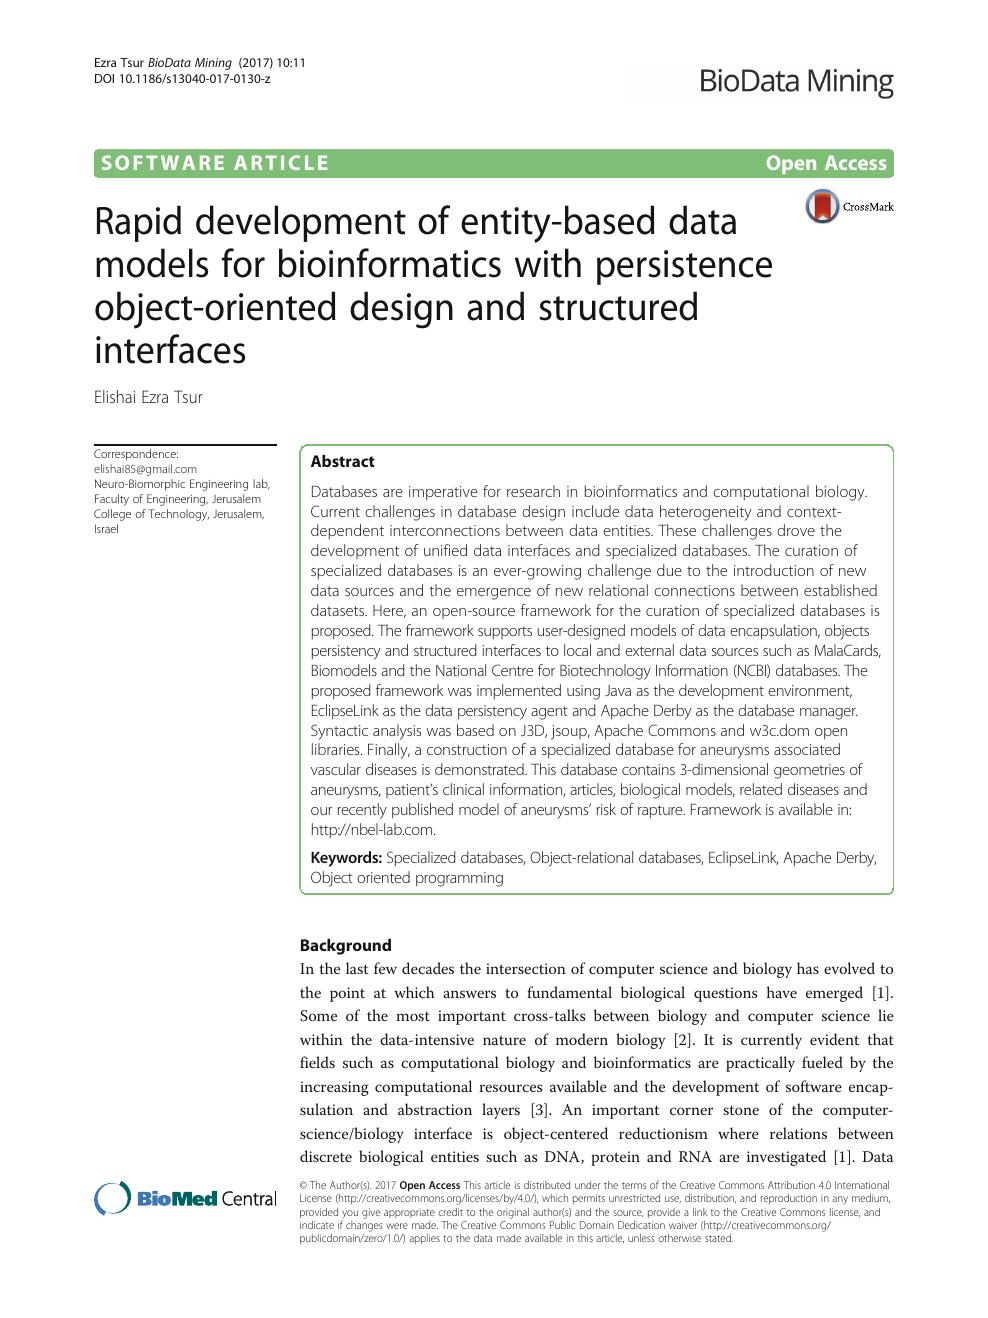 Rapid development of entity-based data models for